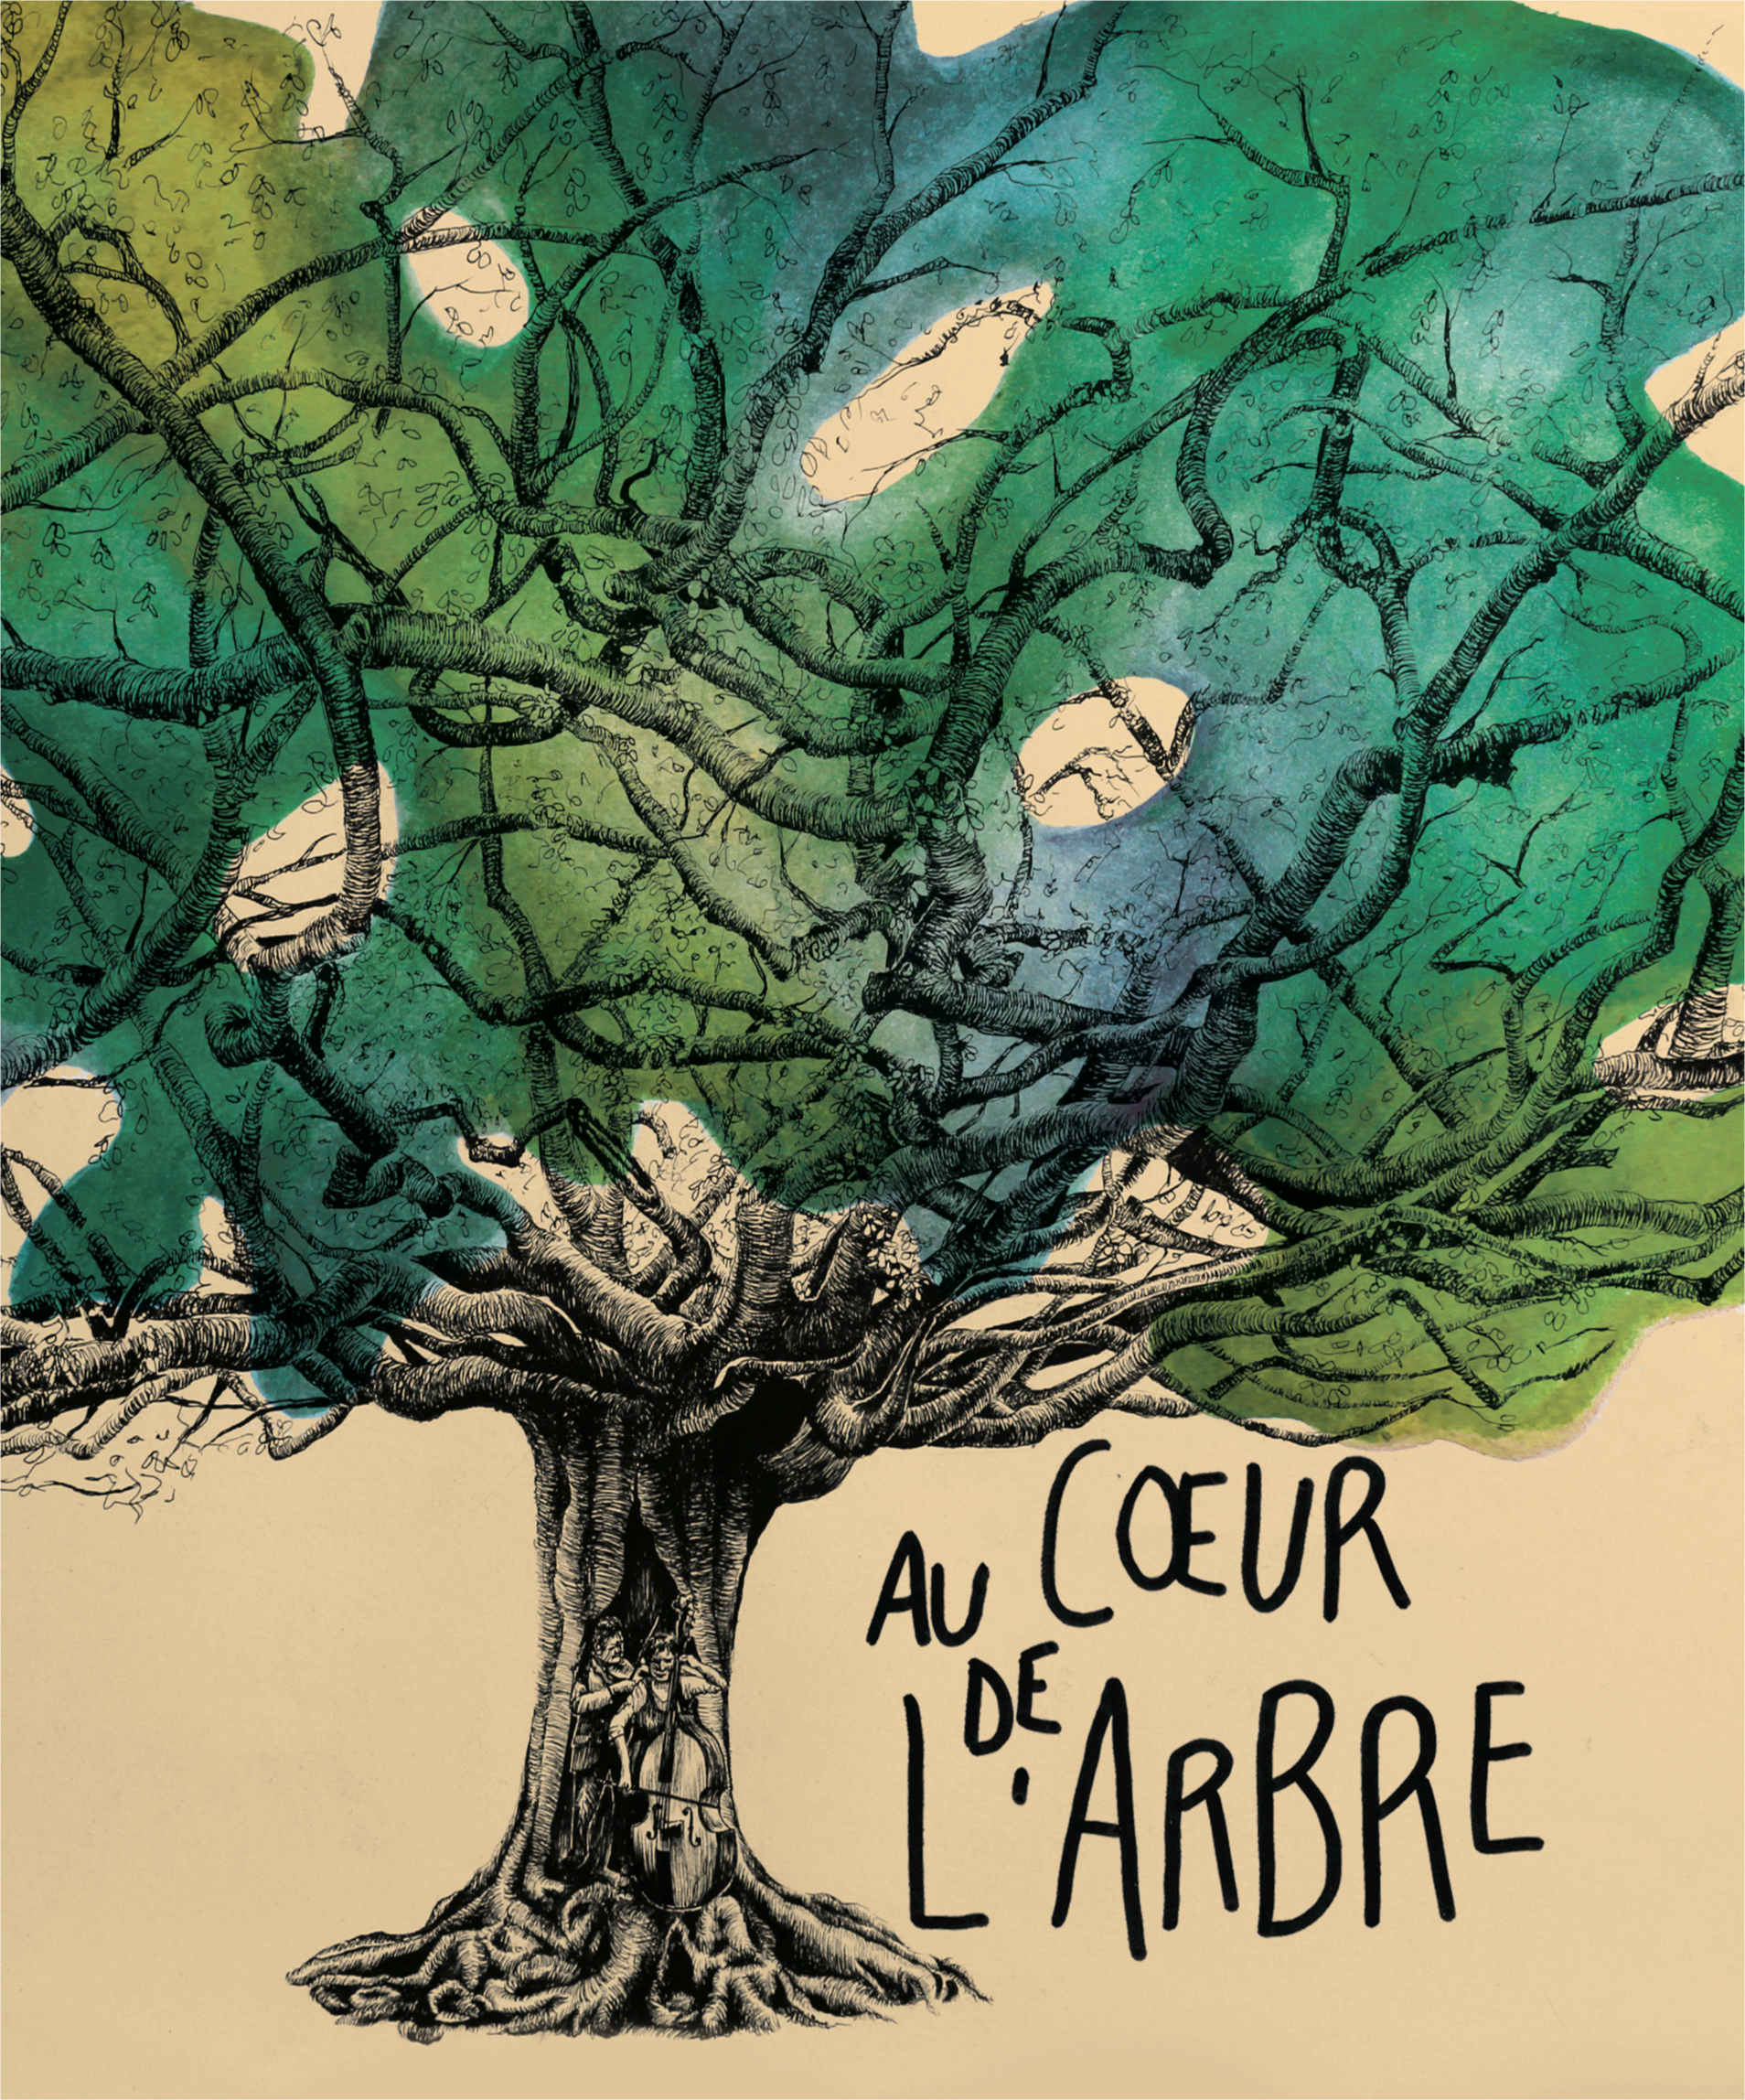 image from livret pédagogique complet3